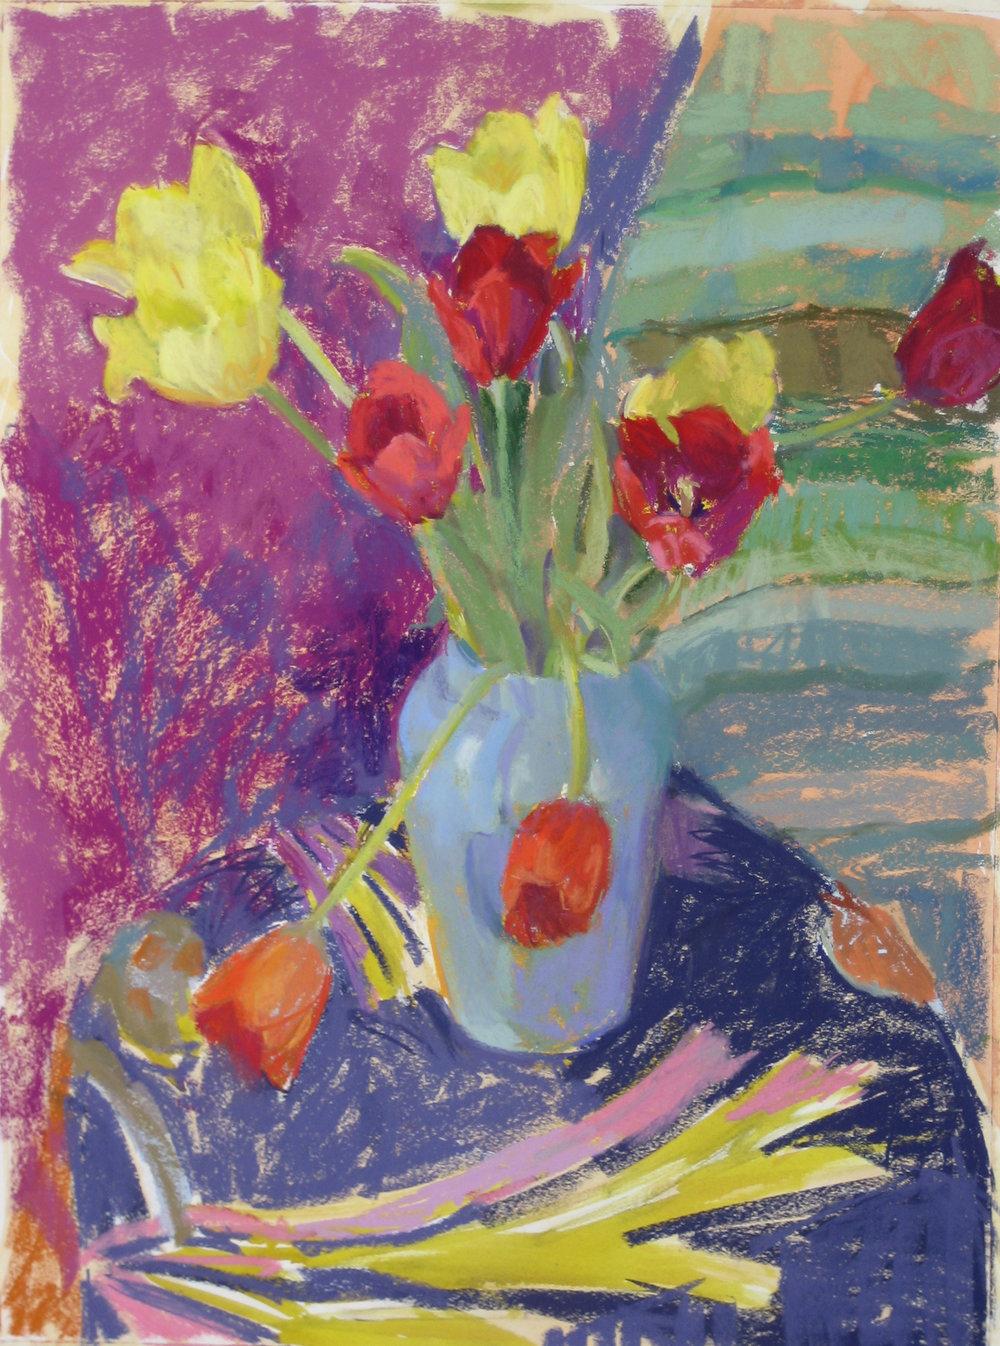 Tulips, February